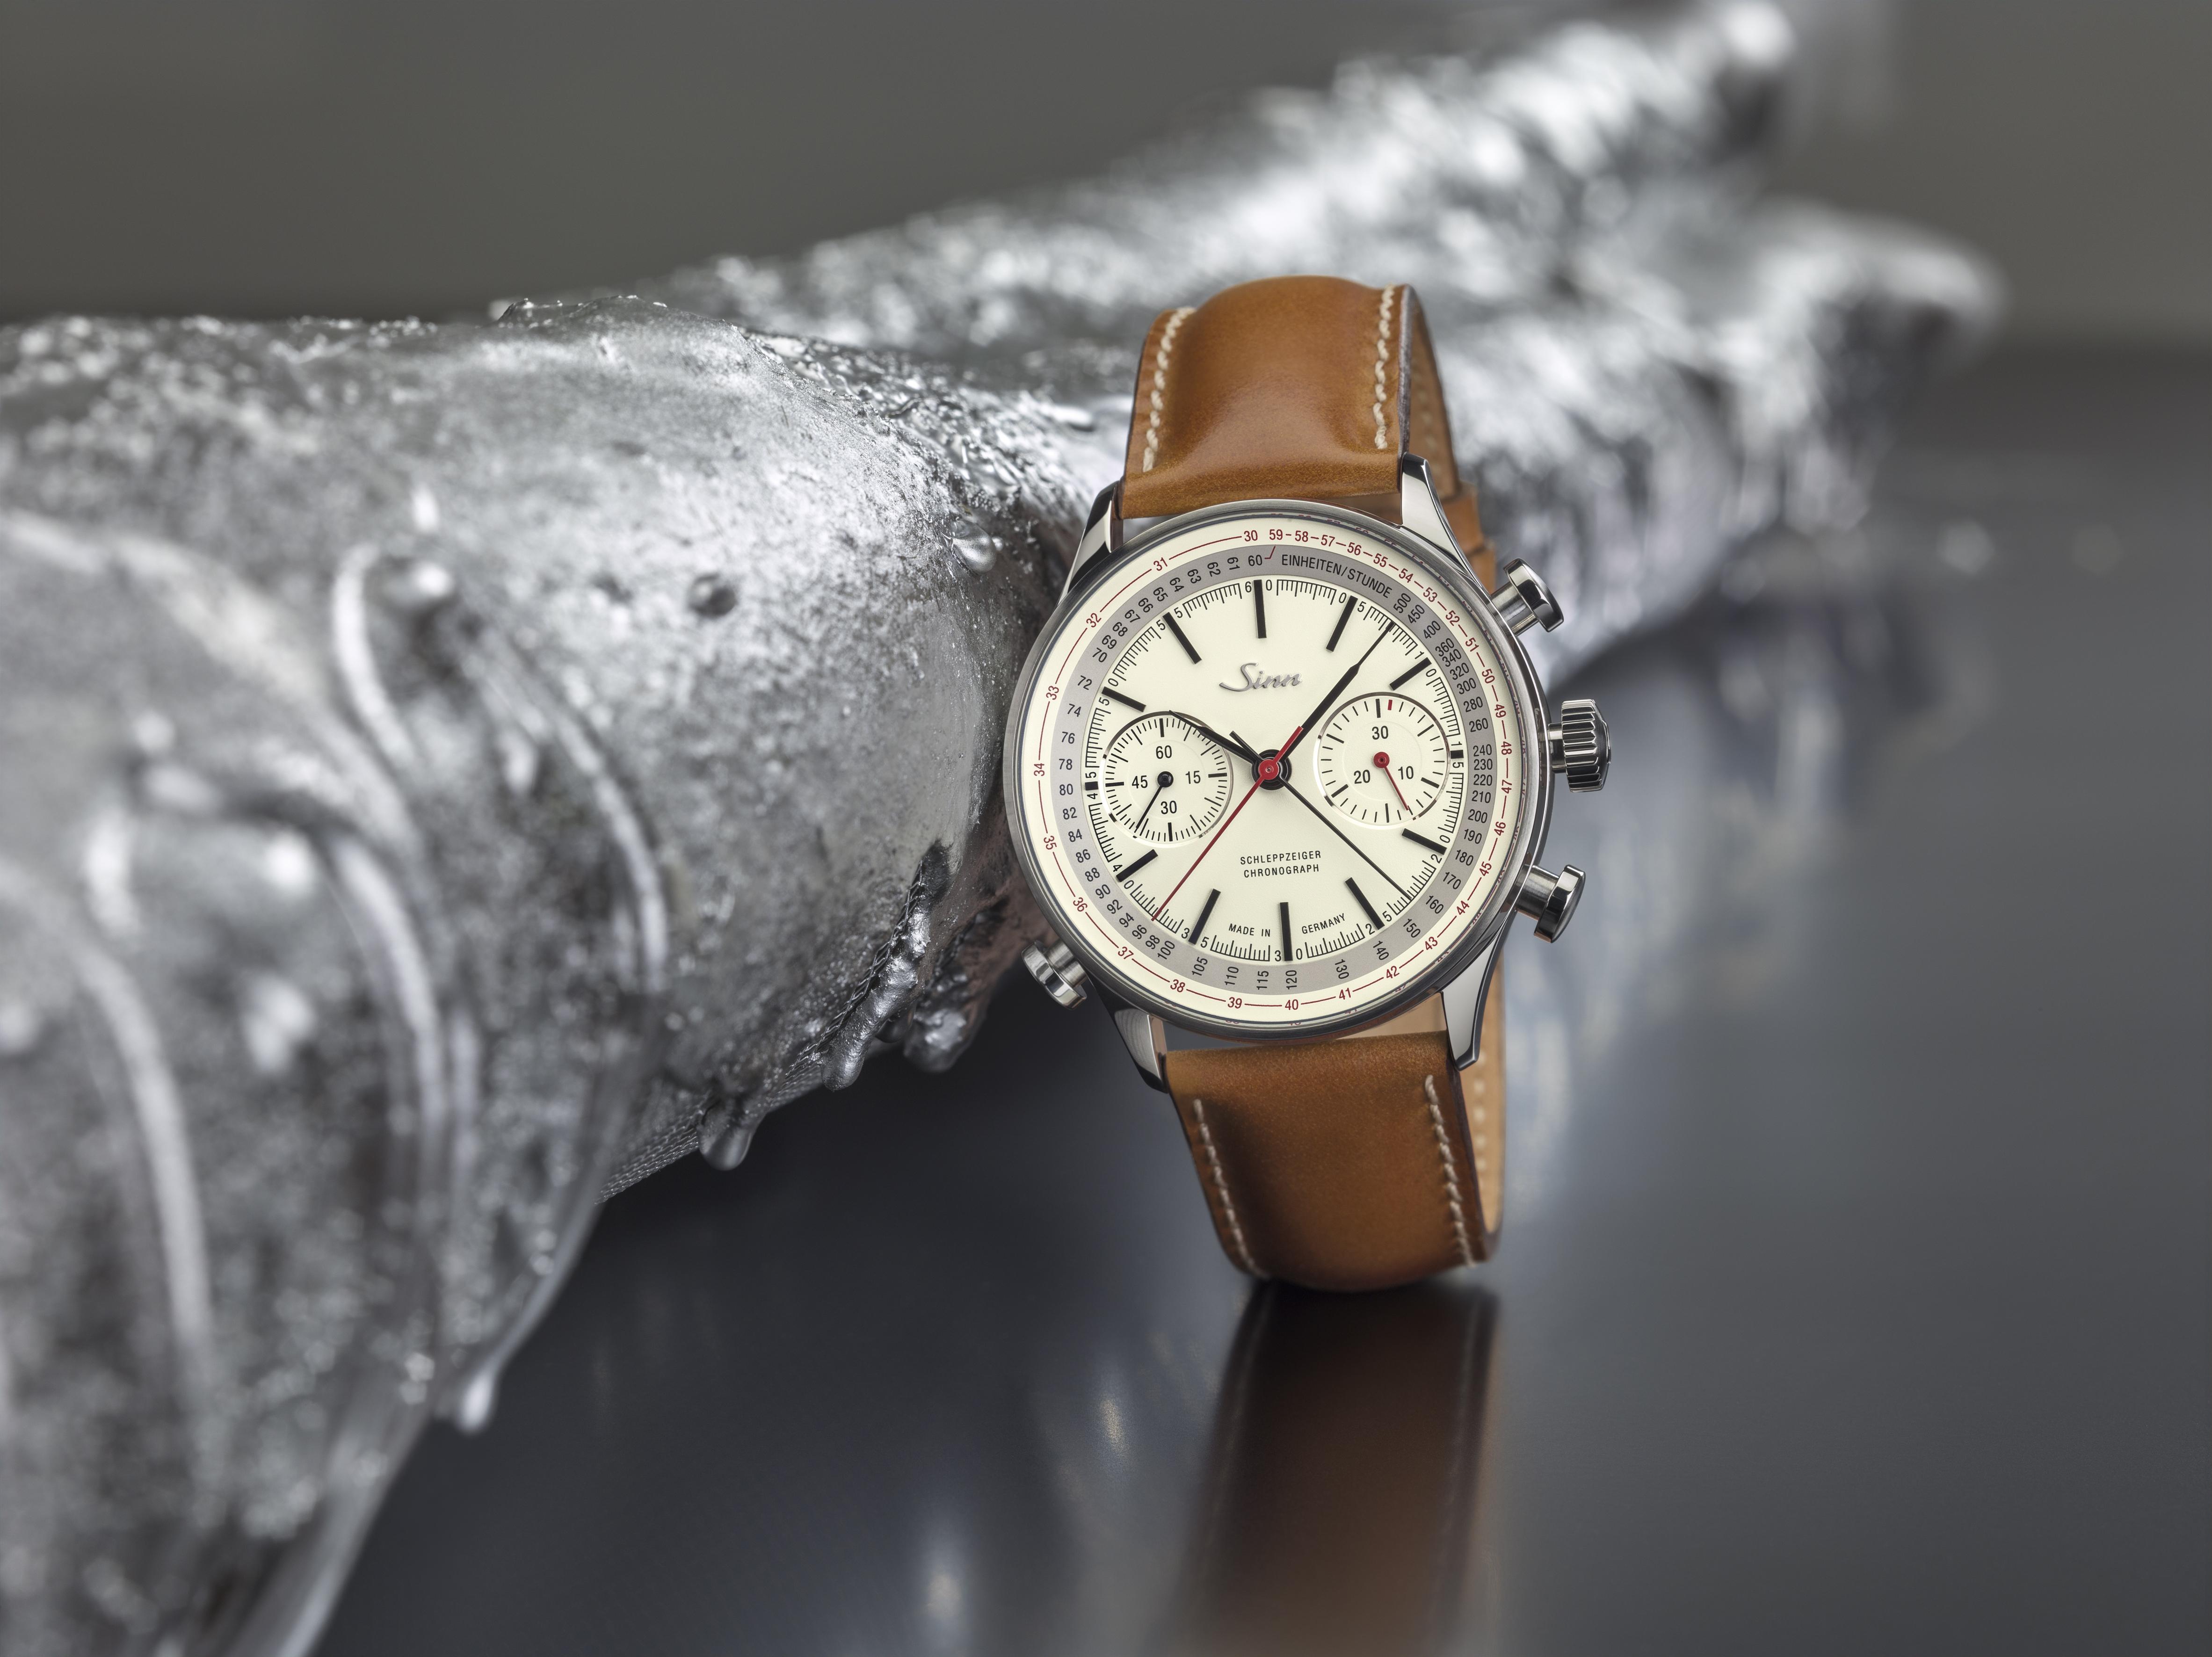 Baselworld 2016: Sinn 910 Anniversary Chronograph